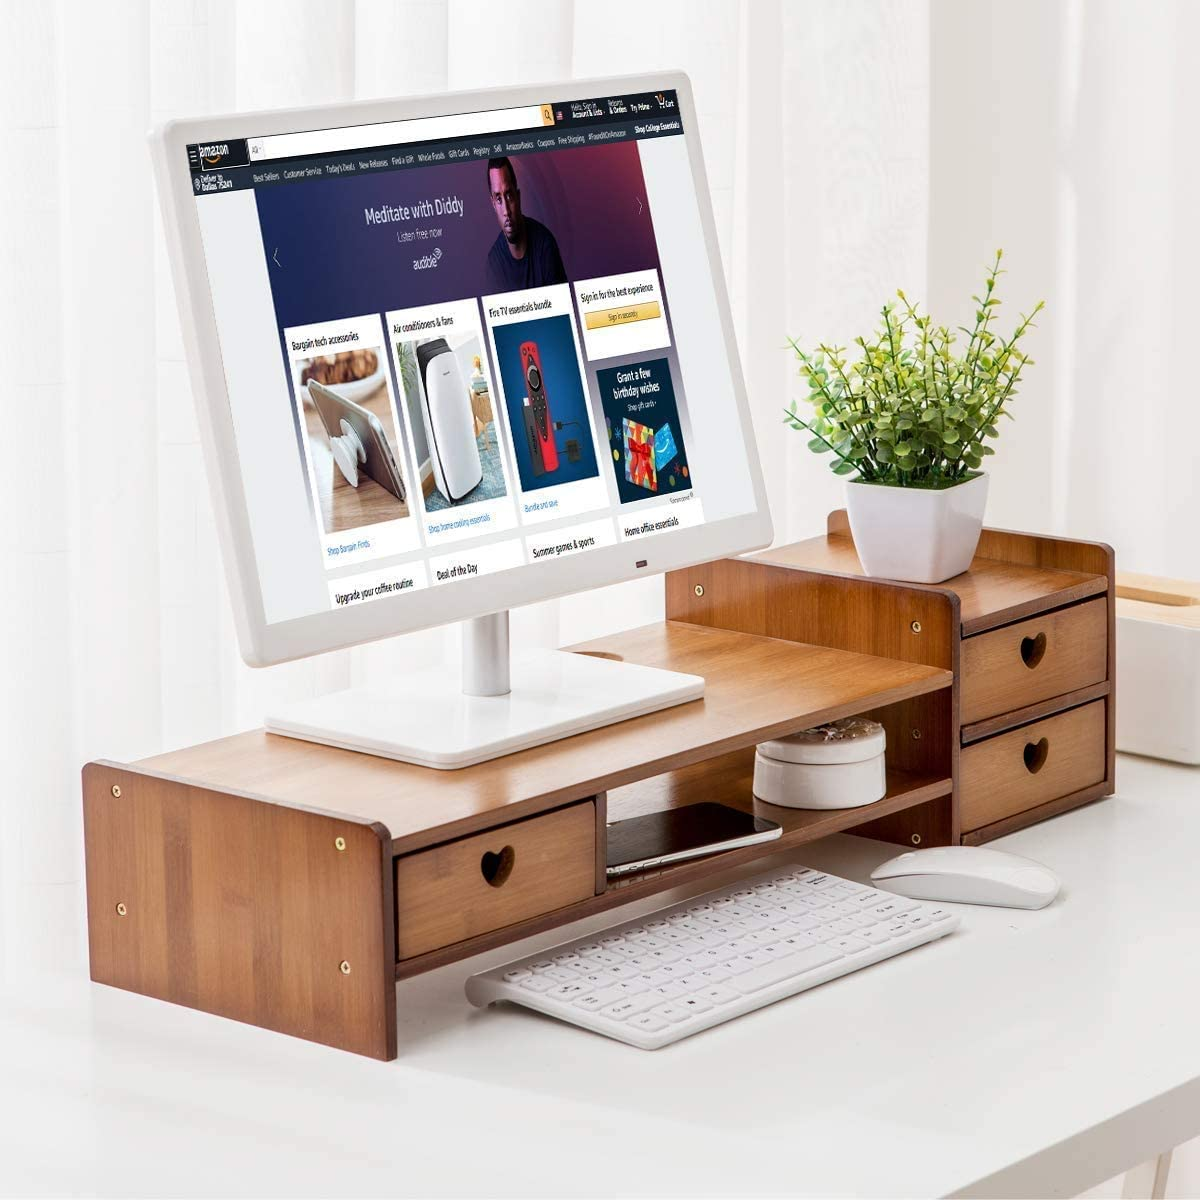 Maydear Bamboo Monitor Stand Riser with Storage Drawer, 2 Tier Desk Organizer Stand for Laptop Computer, Desktop Printer Stand, Versatile as Storage Shelf & Screen Holder